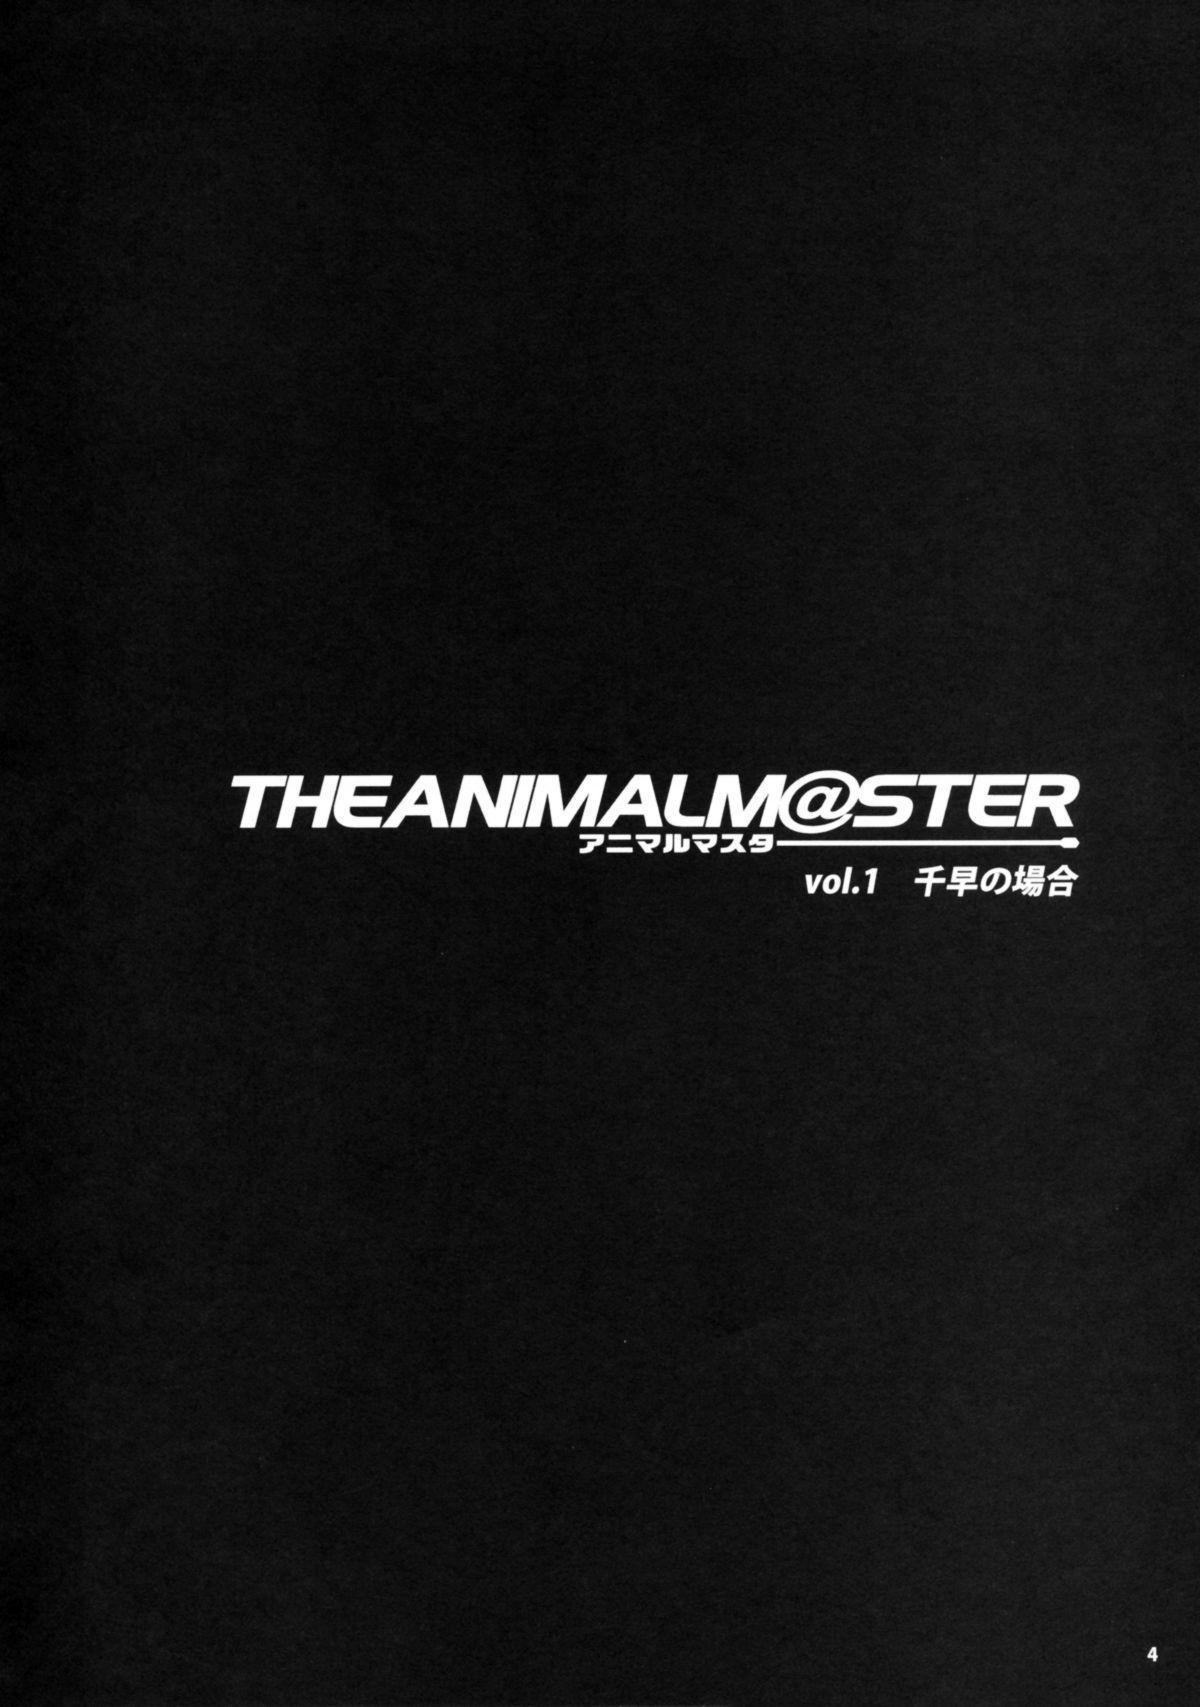 The Animalm@ster Vol. 1 4